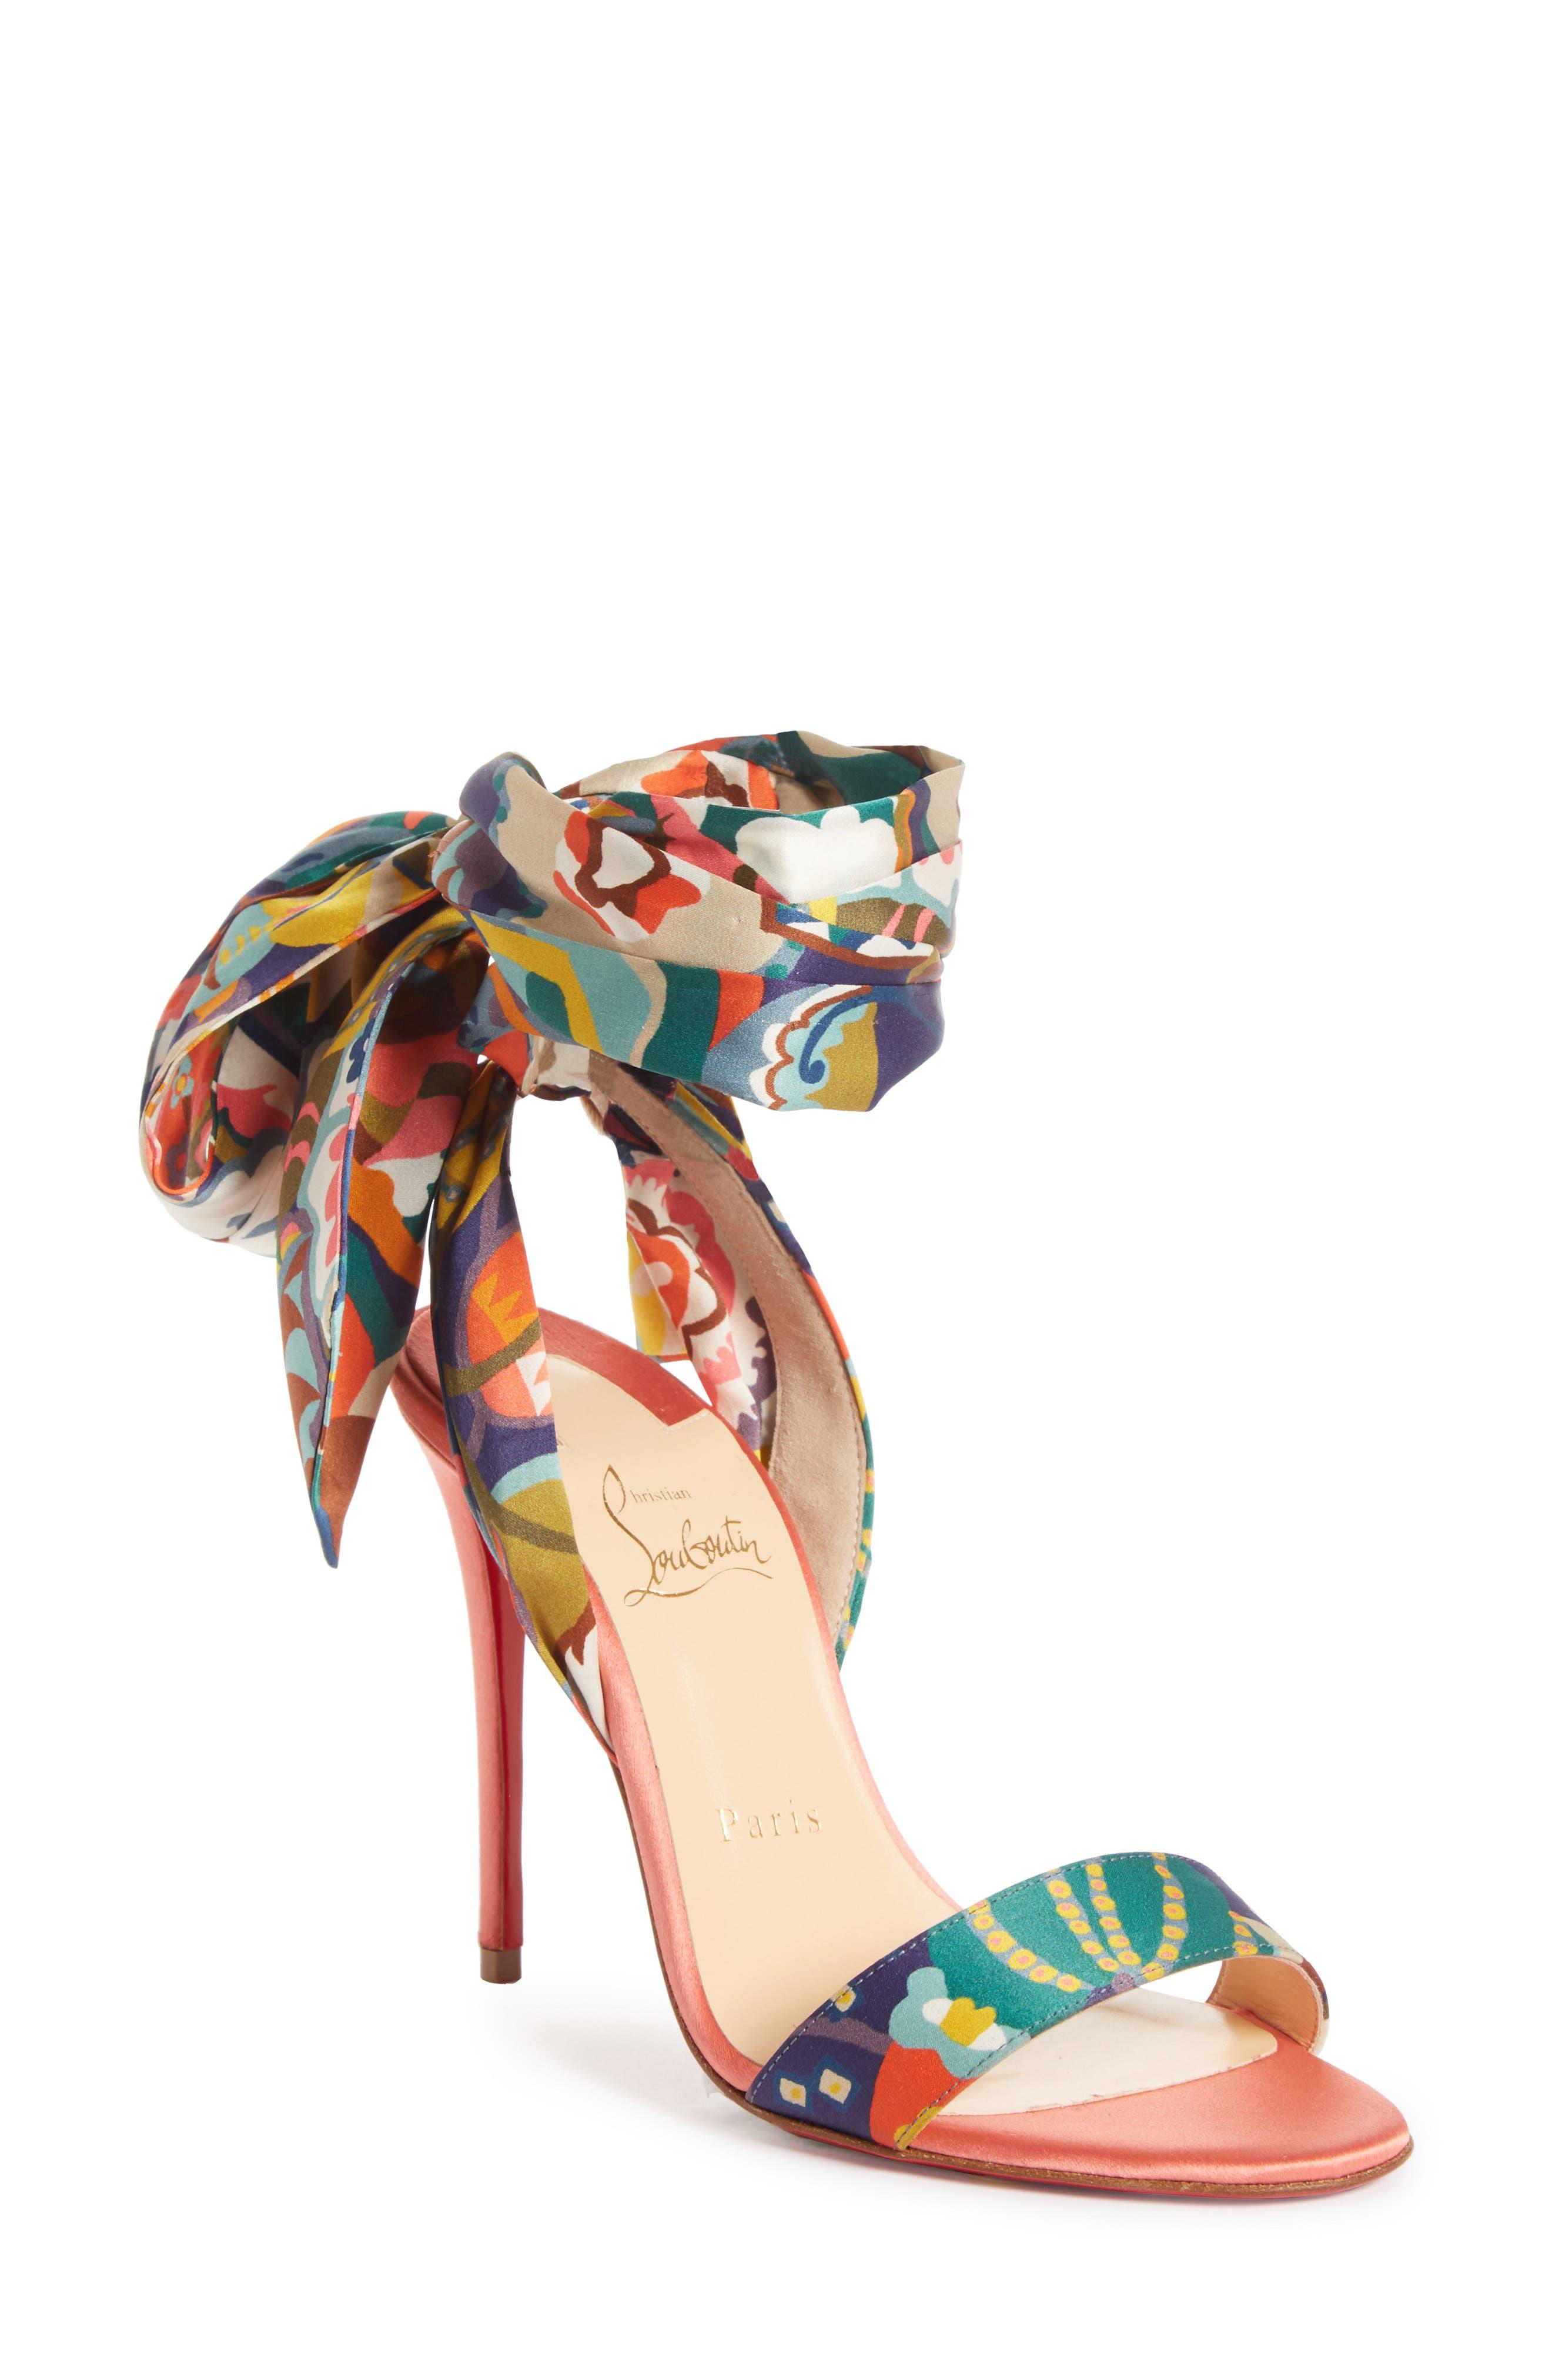 Christian Louboutin Women's Sandale Du Desert Ankle Wrap Sandal 86W4pkjbo6